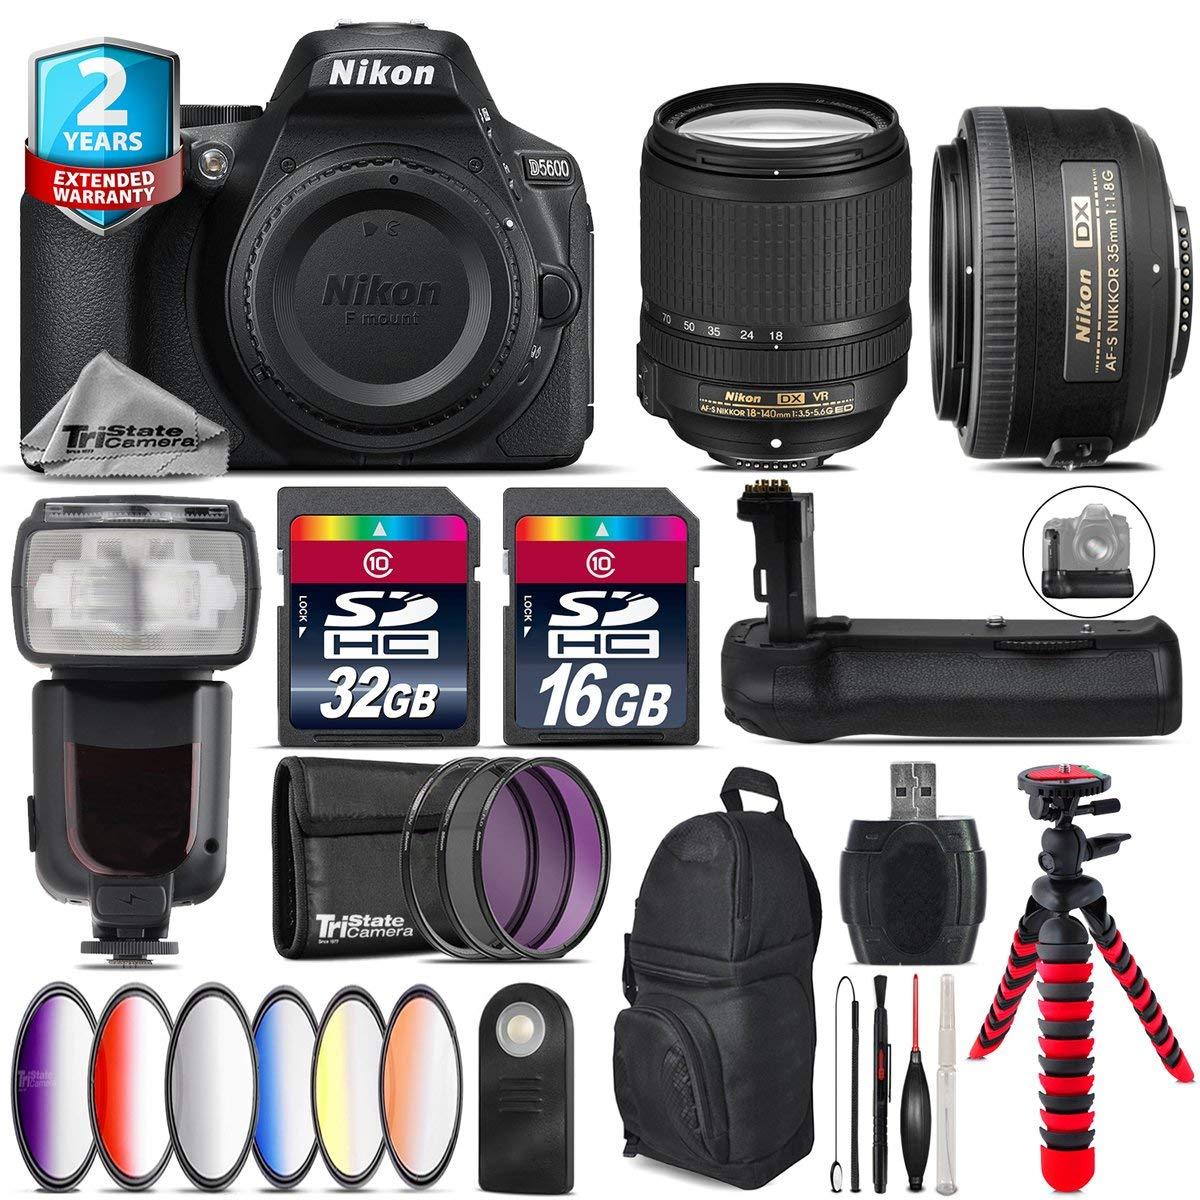 Holiday Saving Bundle for D5600 DSLR Camera + 18-140mm VR Lens + 35mm 1.8G DX Lens + Flash with LCD Display + Battery Grip + 6PC Graduated Color Filter + 2yr Warranty - International Version